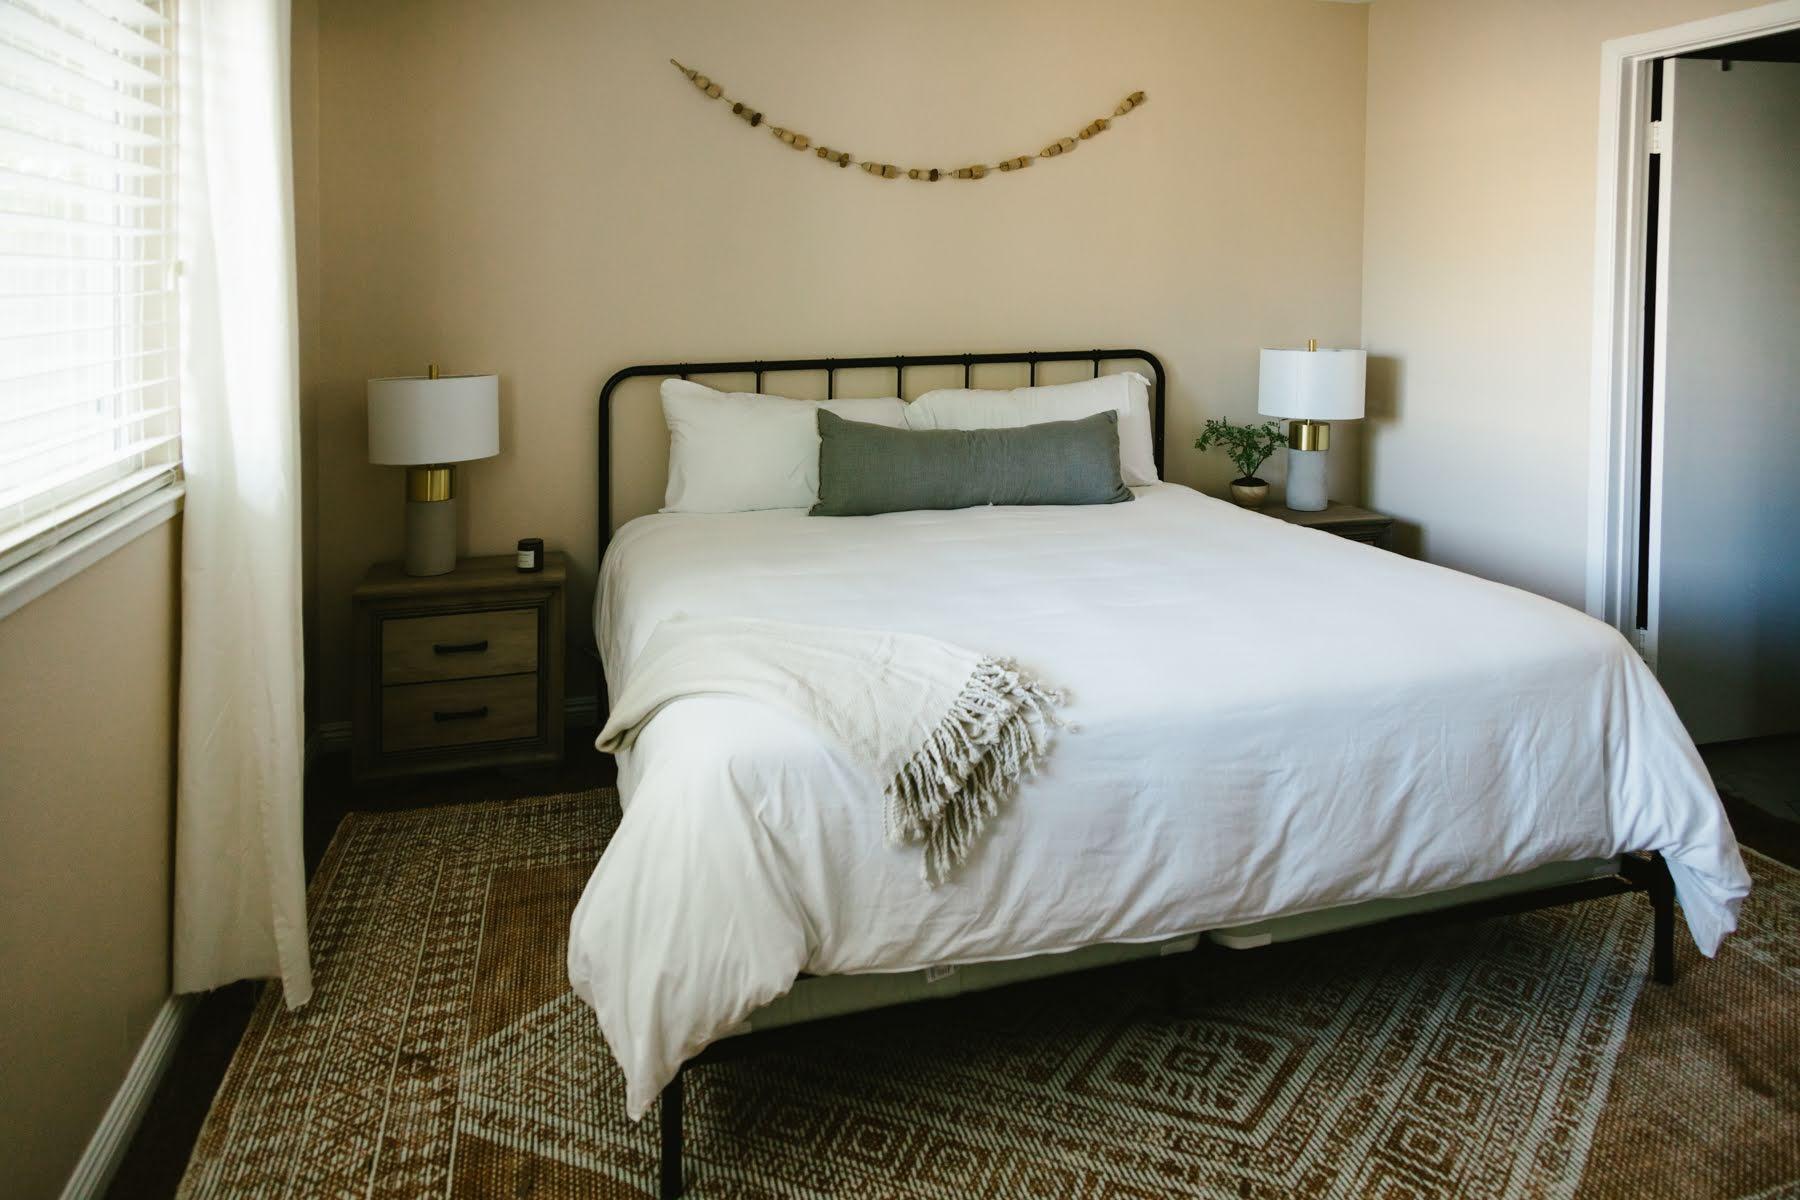 Crisp bedding